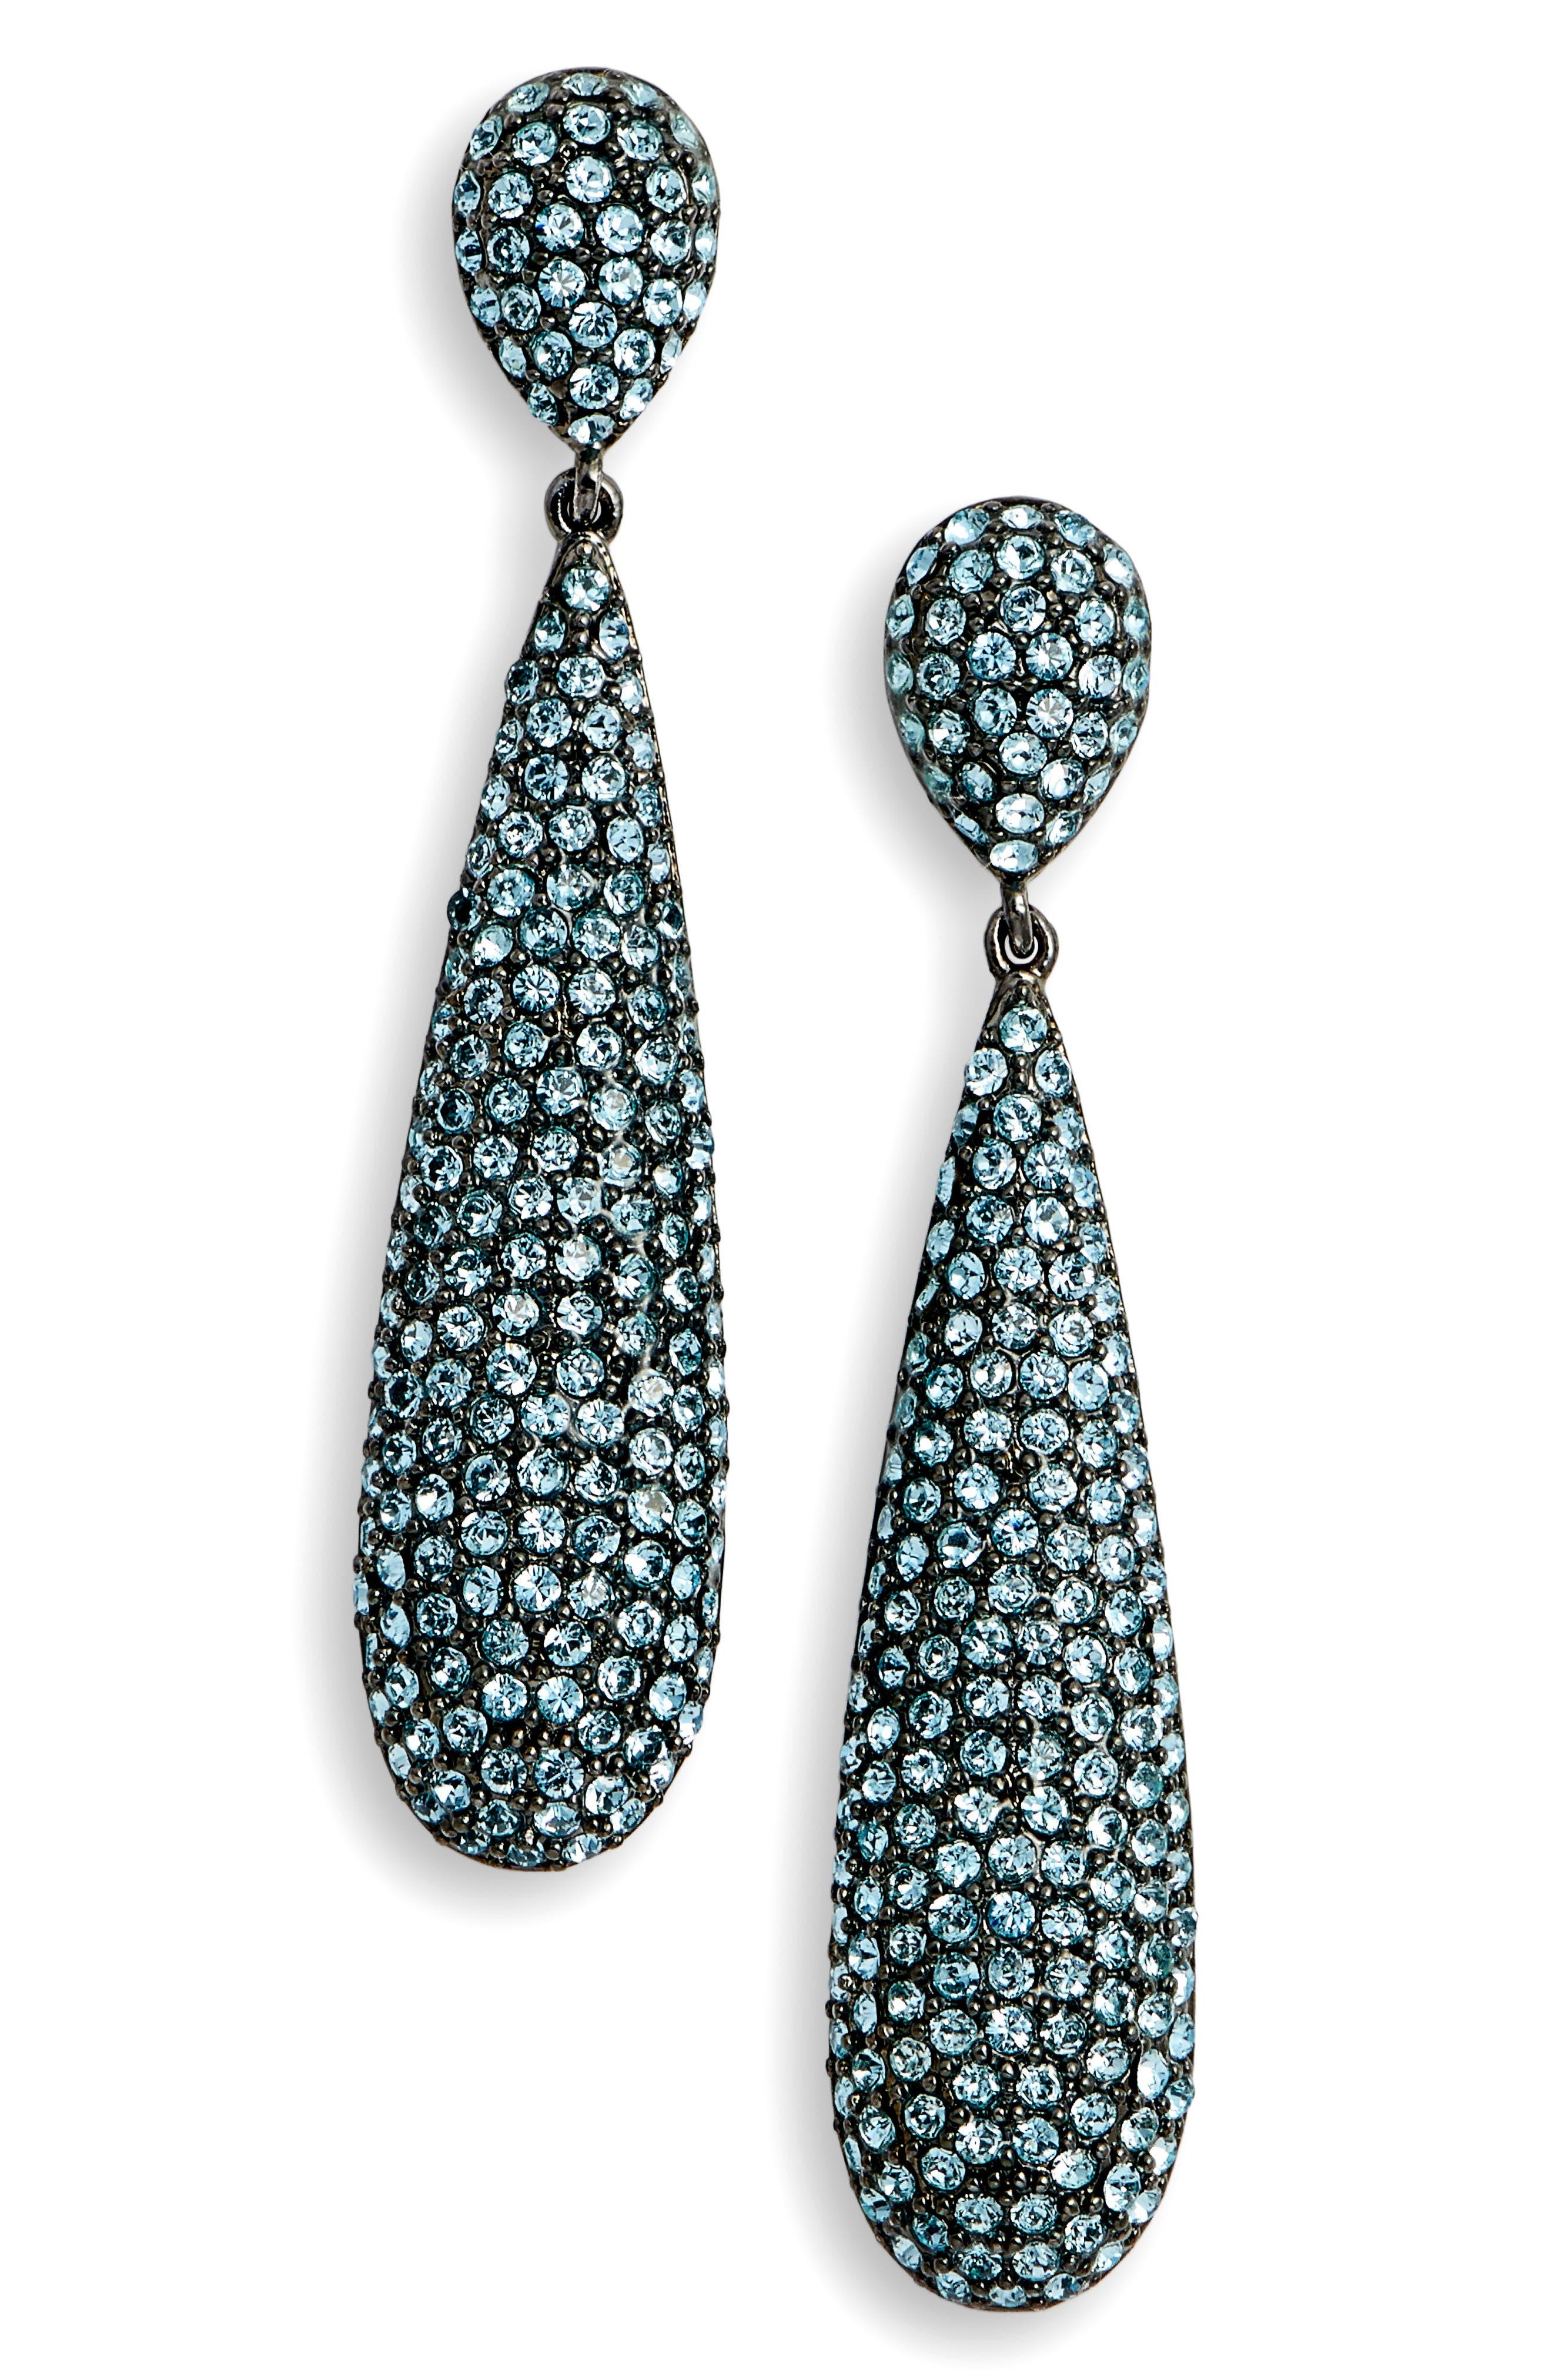 Elongated Pavé Swarovski Crystal Teardrop Earrings,                             Main thumbnail 1, color,                             AQUAMARINE/ BLACK SILVER